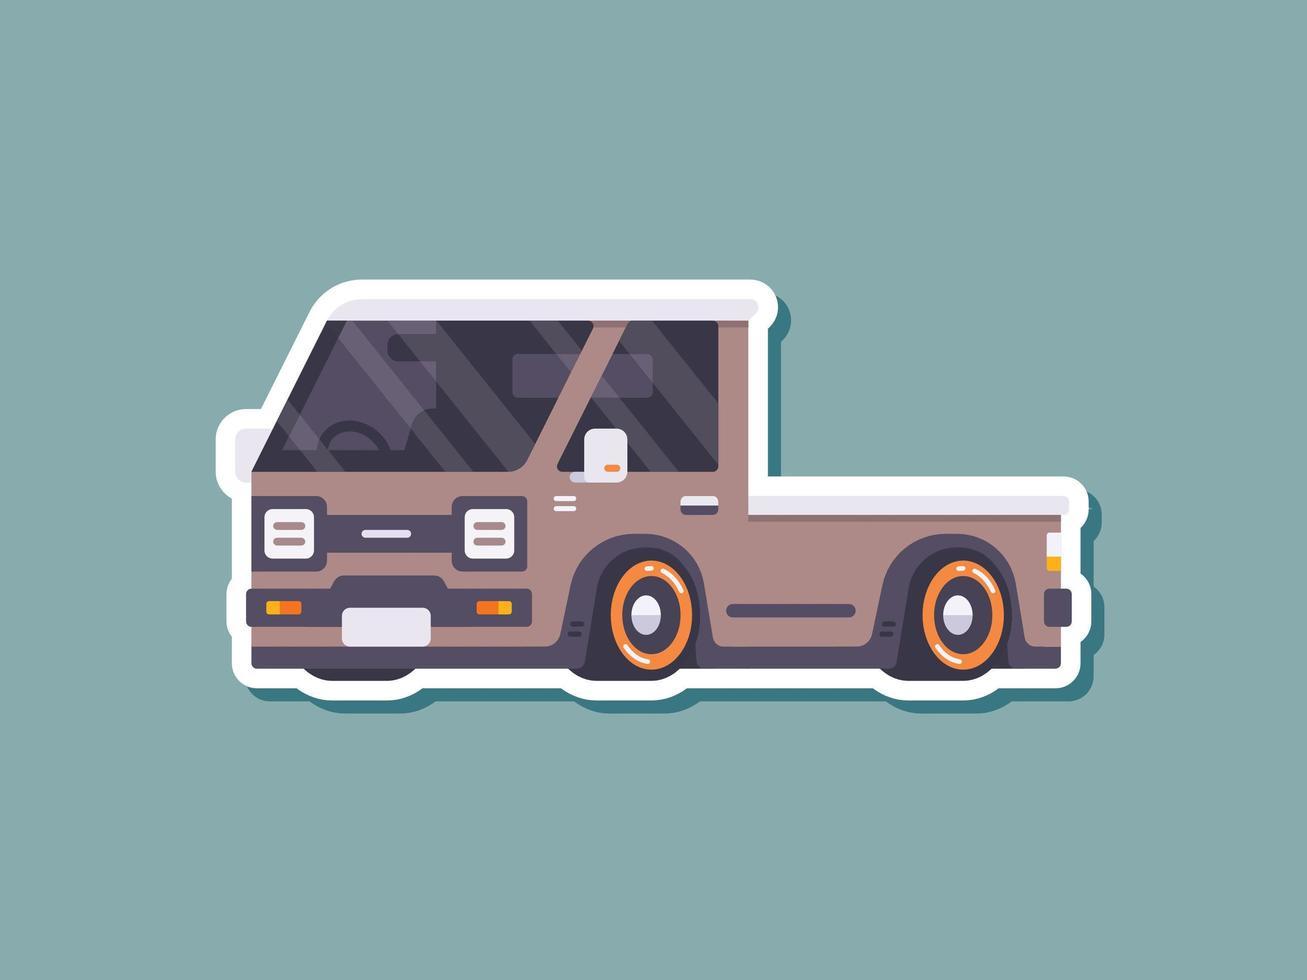 pick-up auto sticker in vlakke stijl vector